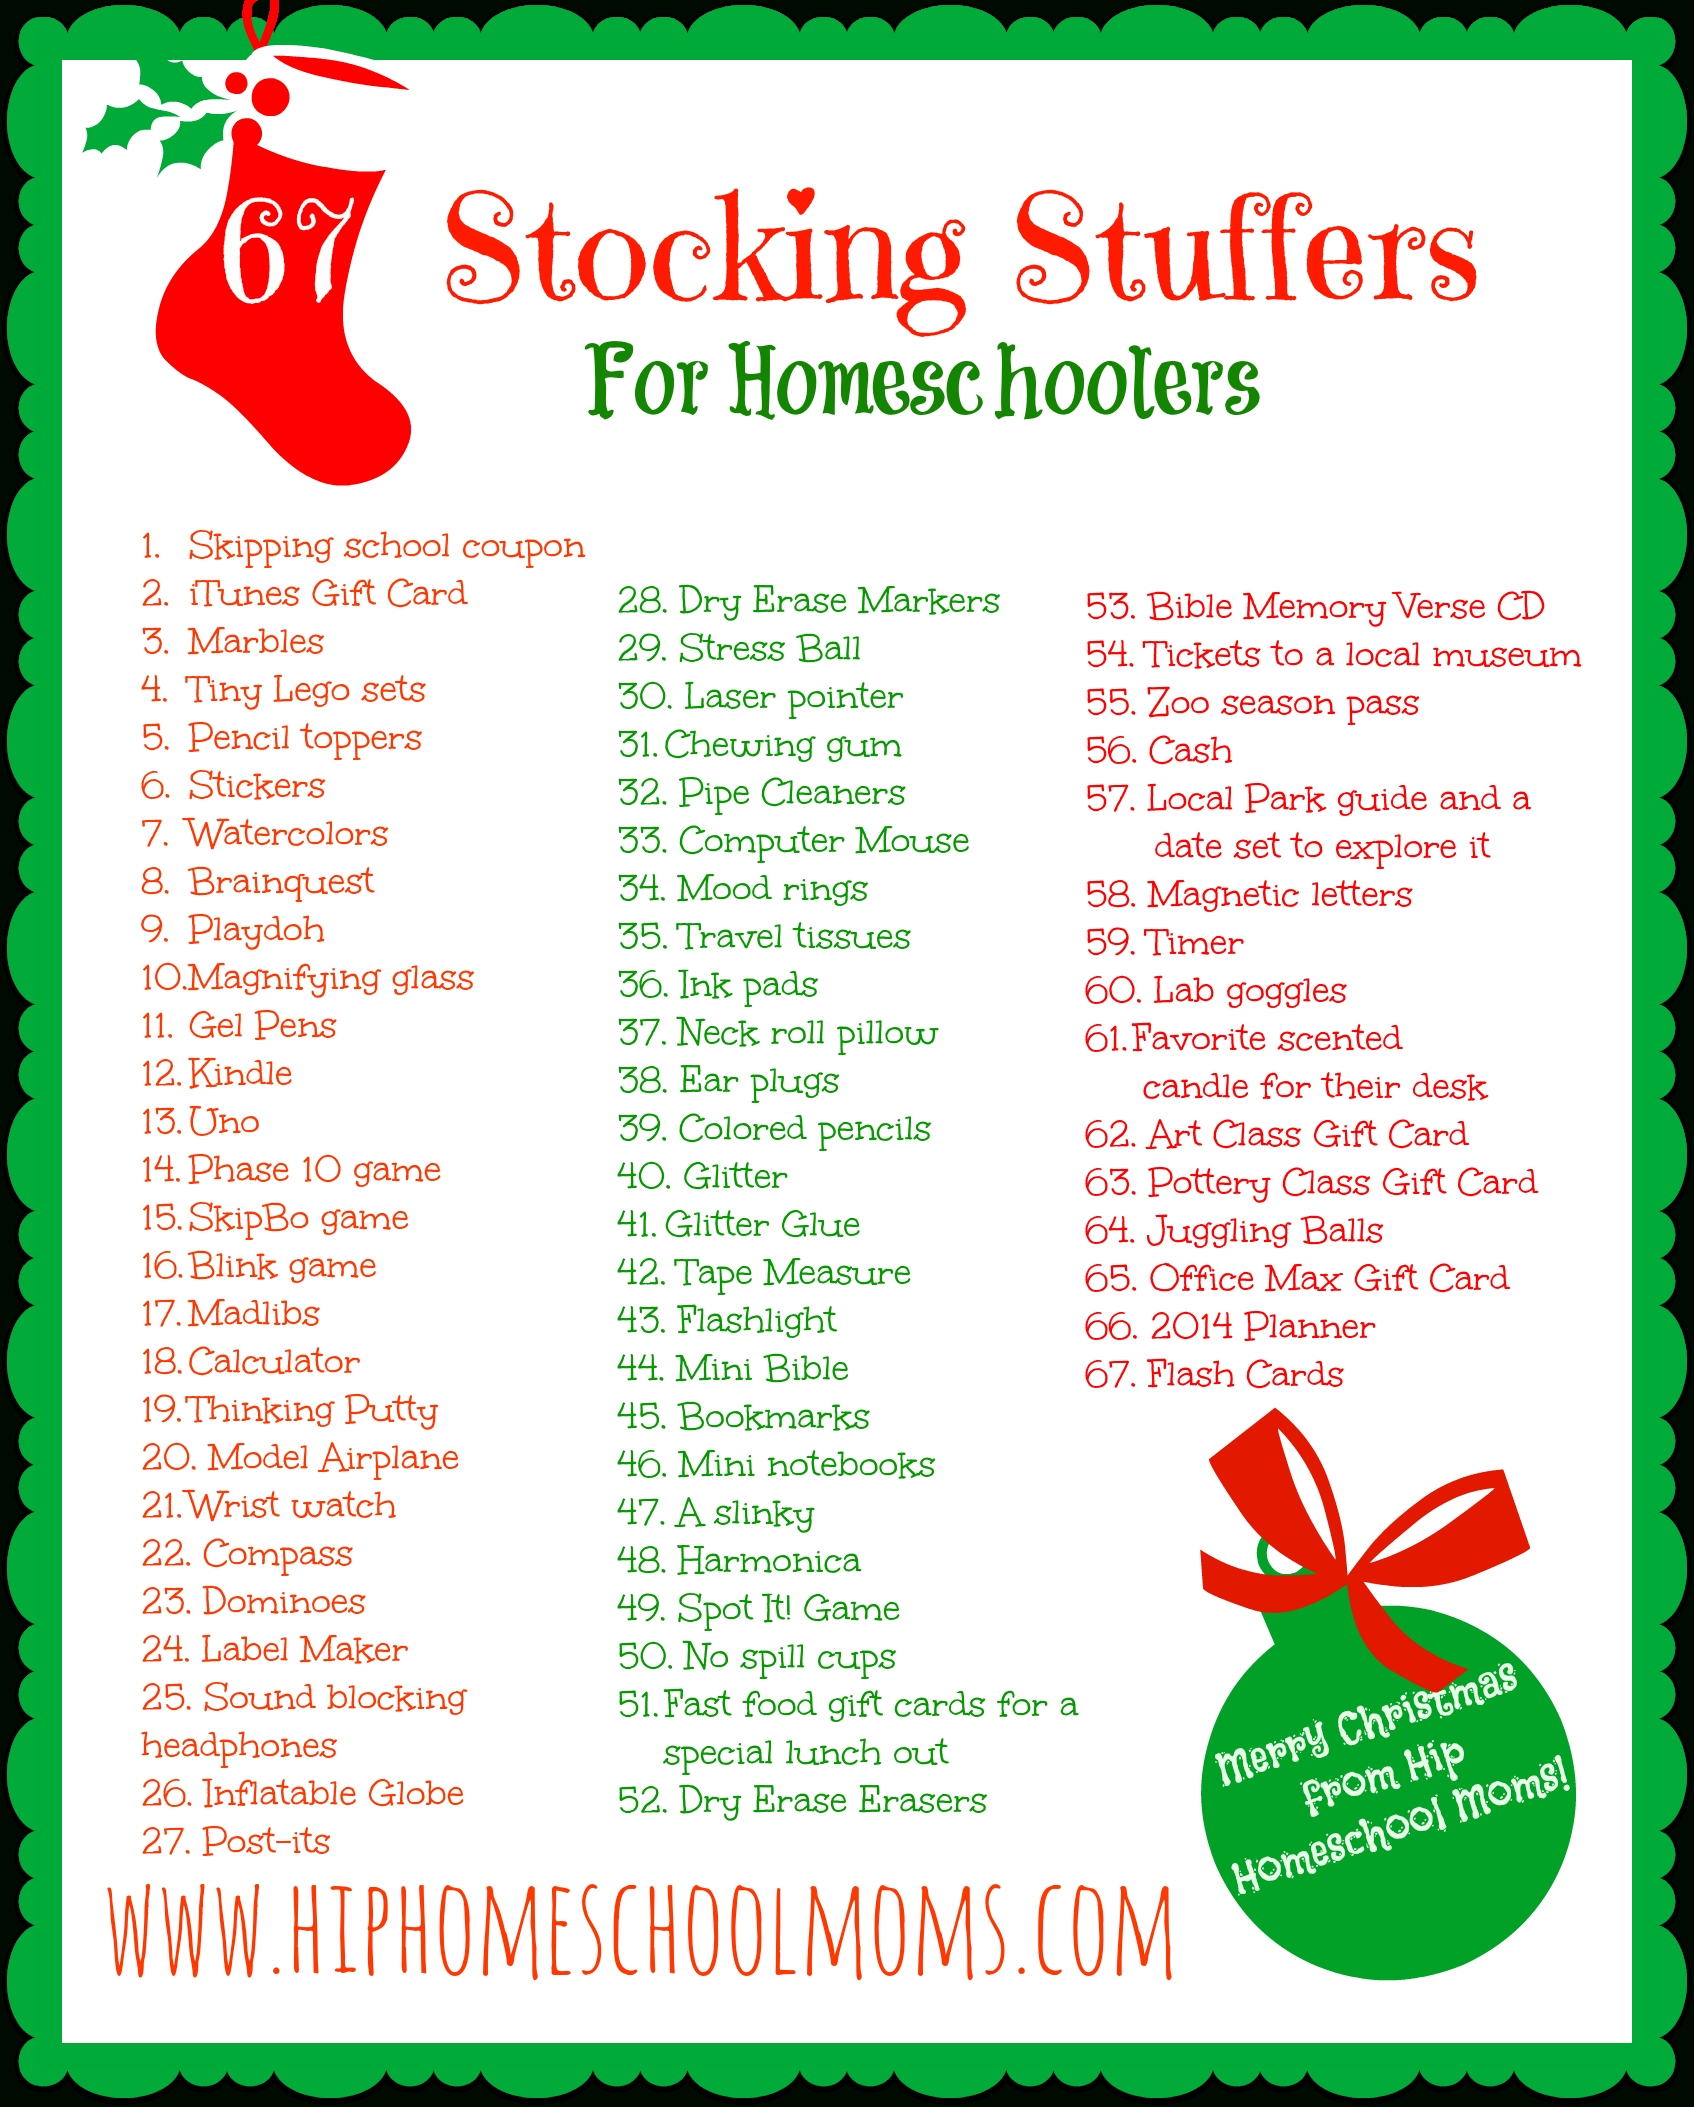 10 Great Christmas Stocking Stuffer Ideas For Adults printable homeschool stocking stuffer ideas hip homeschool moms 2